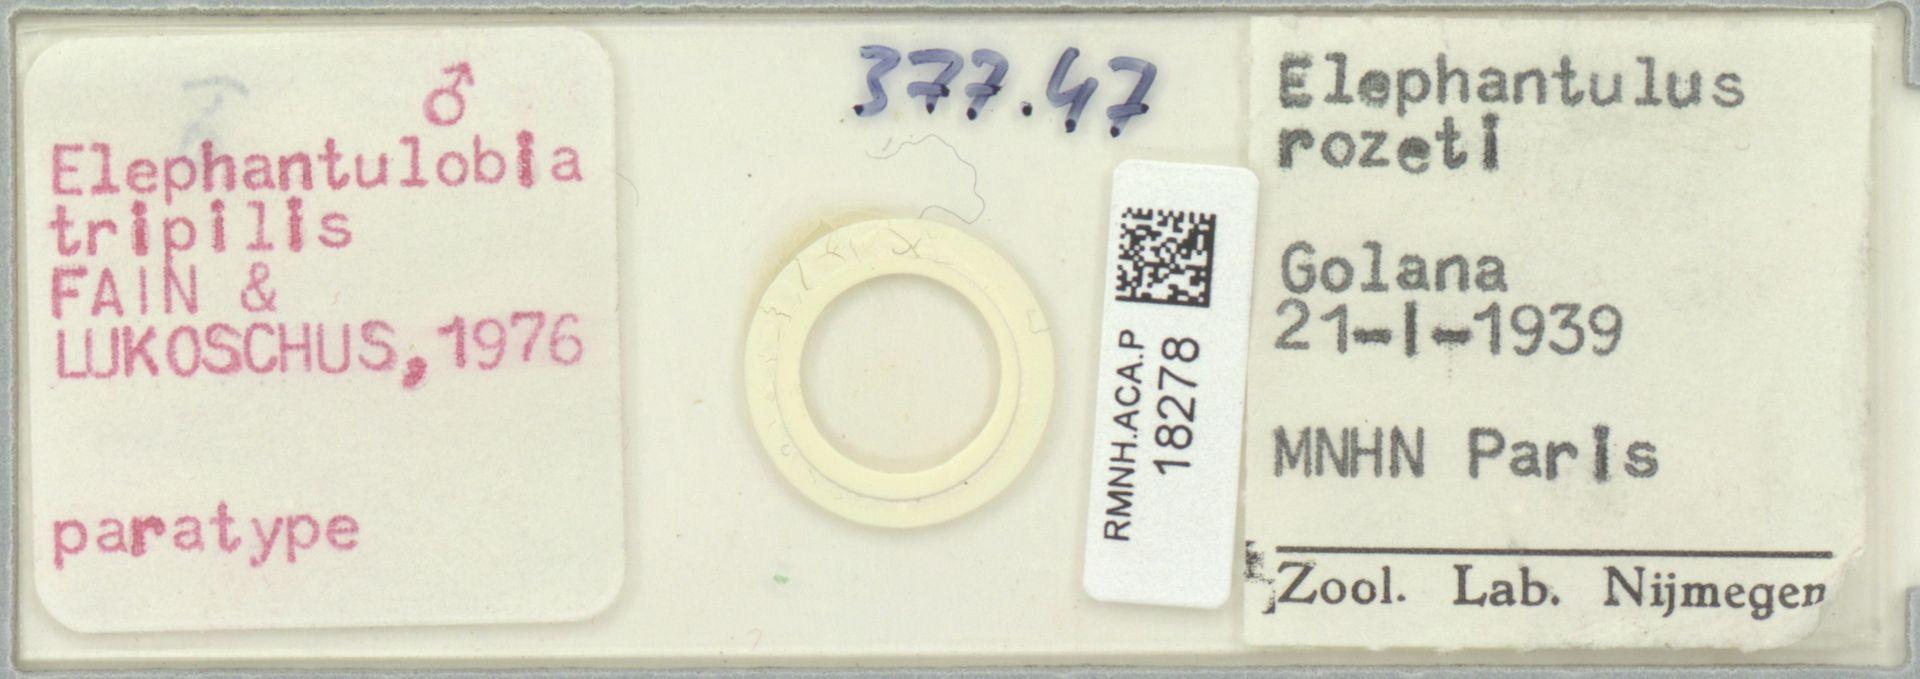 RMNH.ACA.P.18278 | Elephantulobia tripilis Fain & Lukoschus, 1976